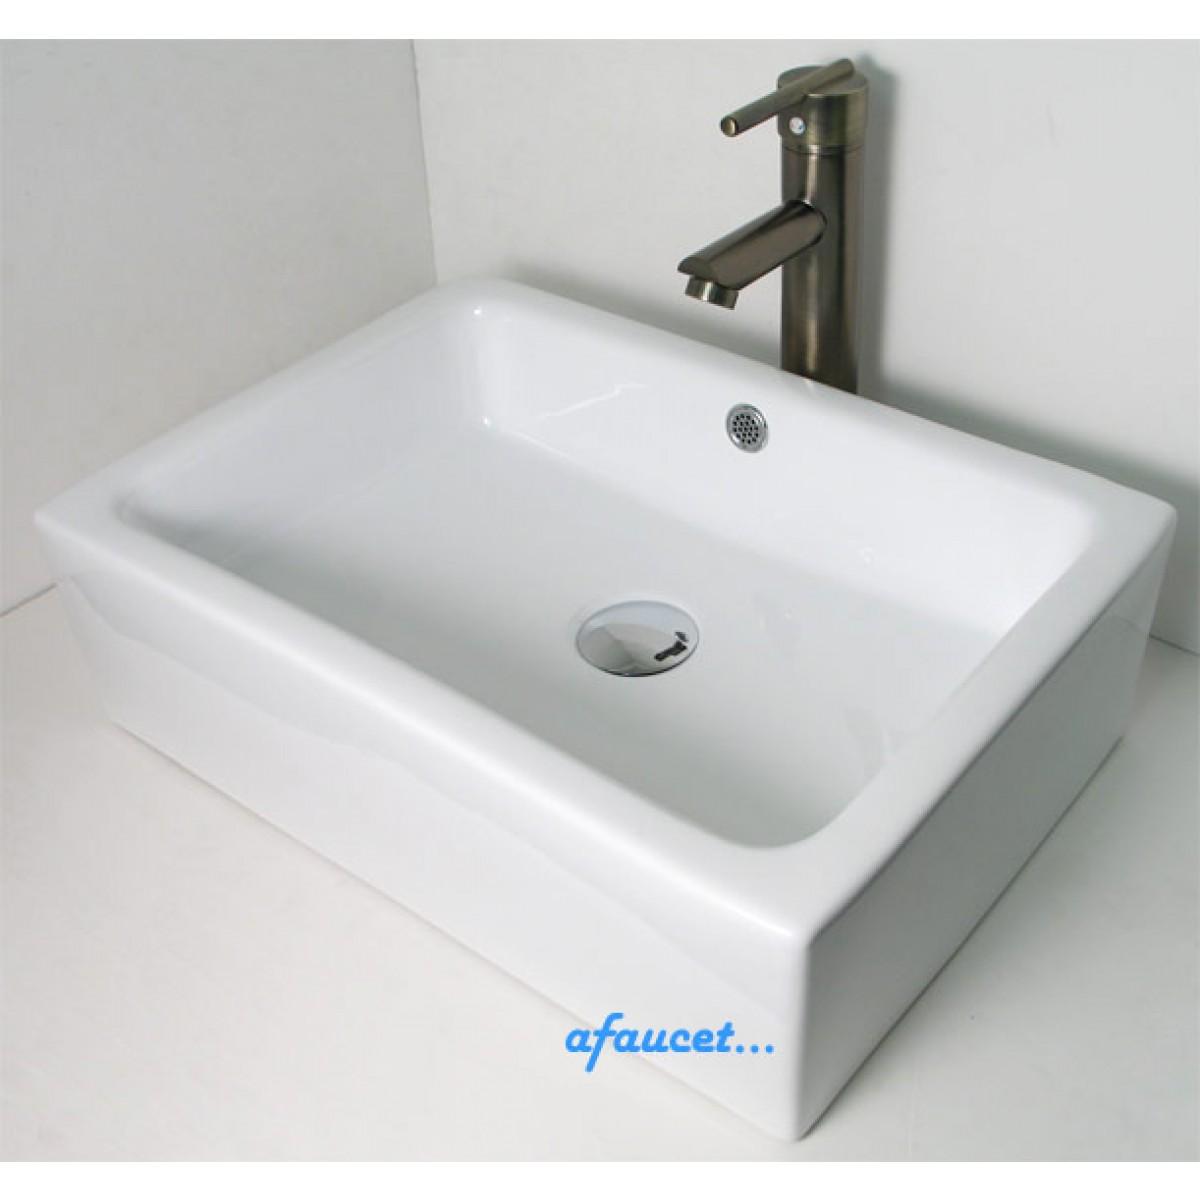 Rectangular White Black Porcelain Ceramic Bathroom Vessel Sink 20 X 14 5 Inch